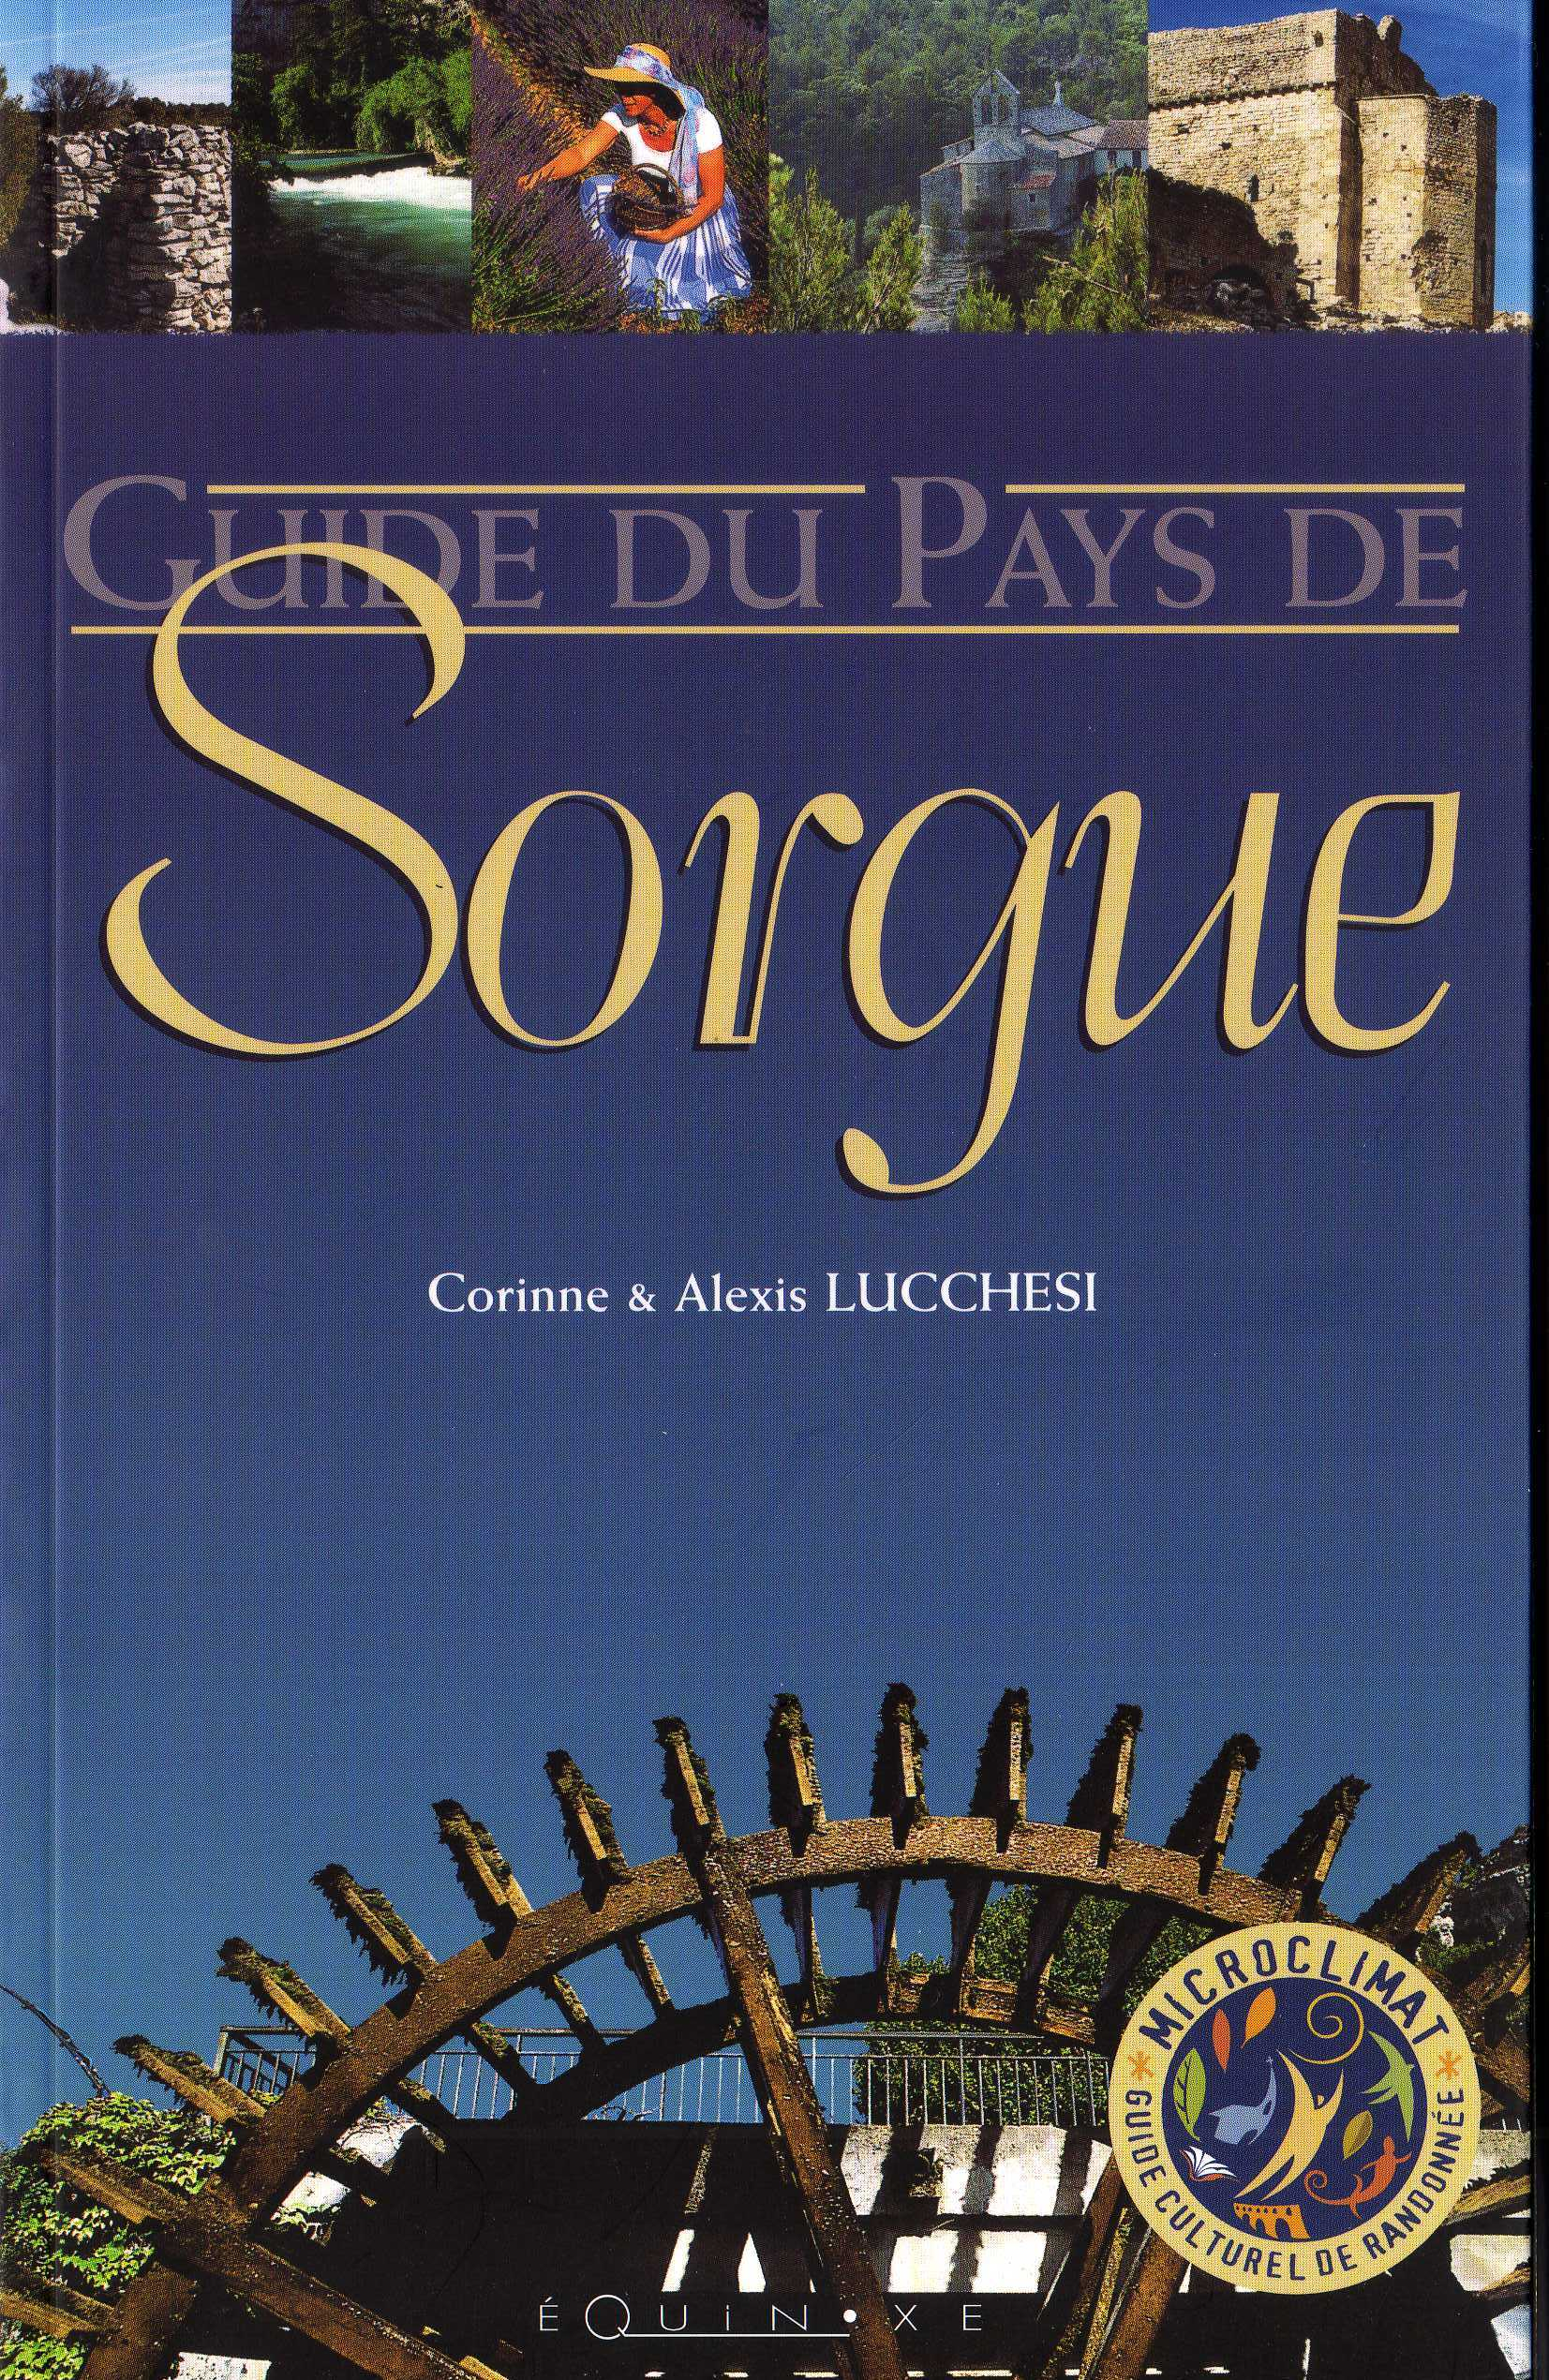 pays_des_sorgue.jpg